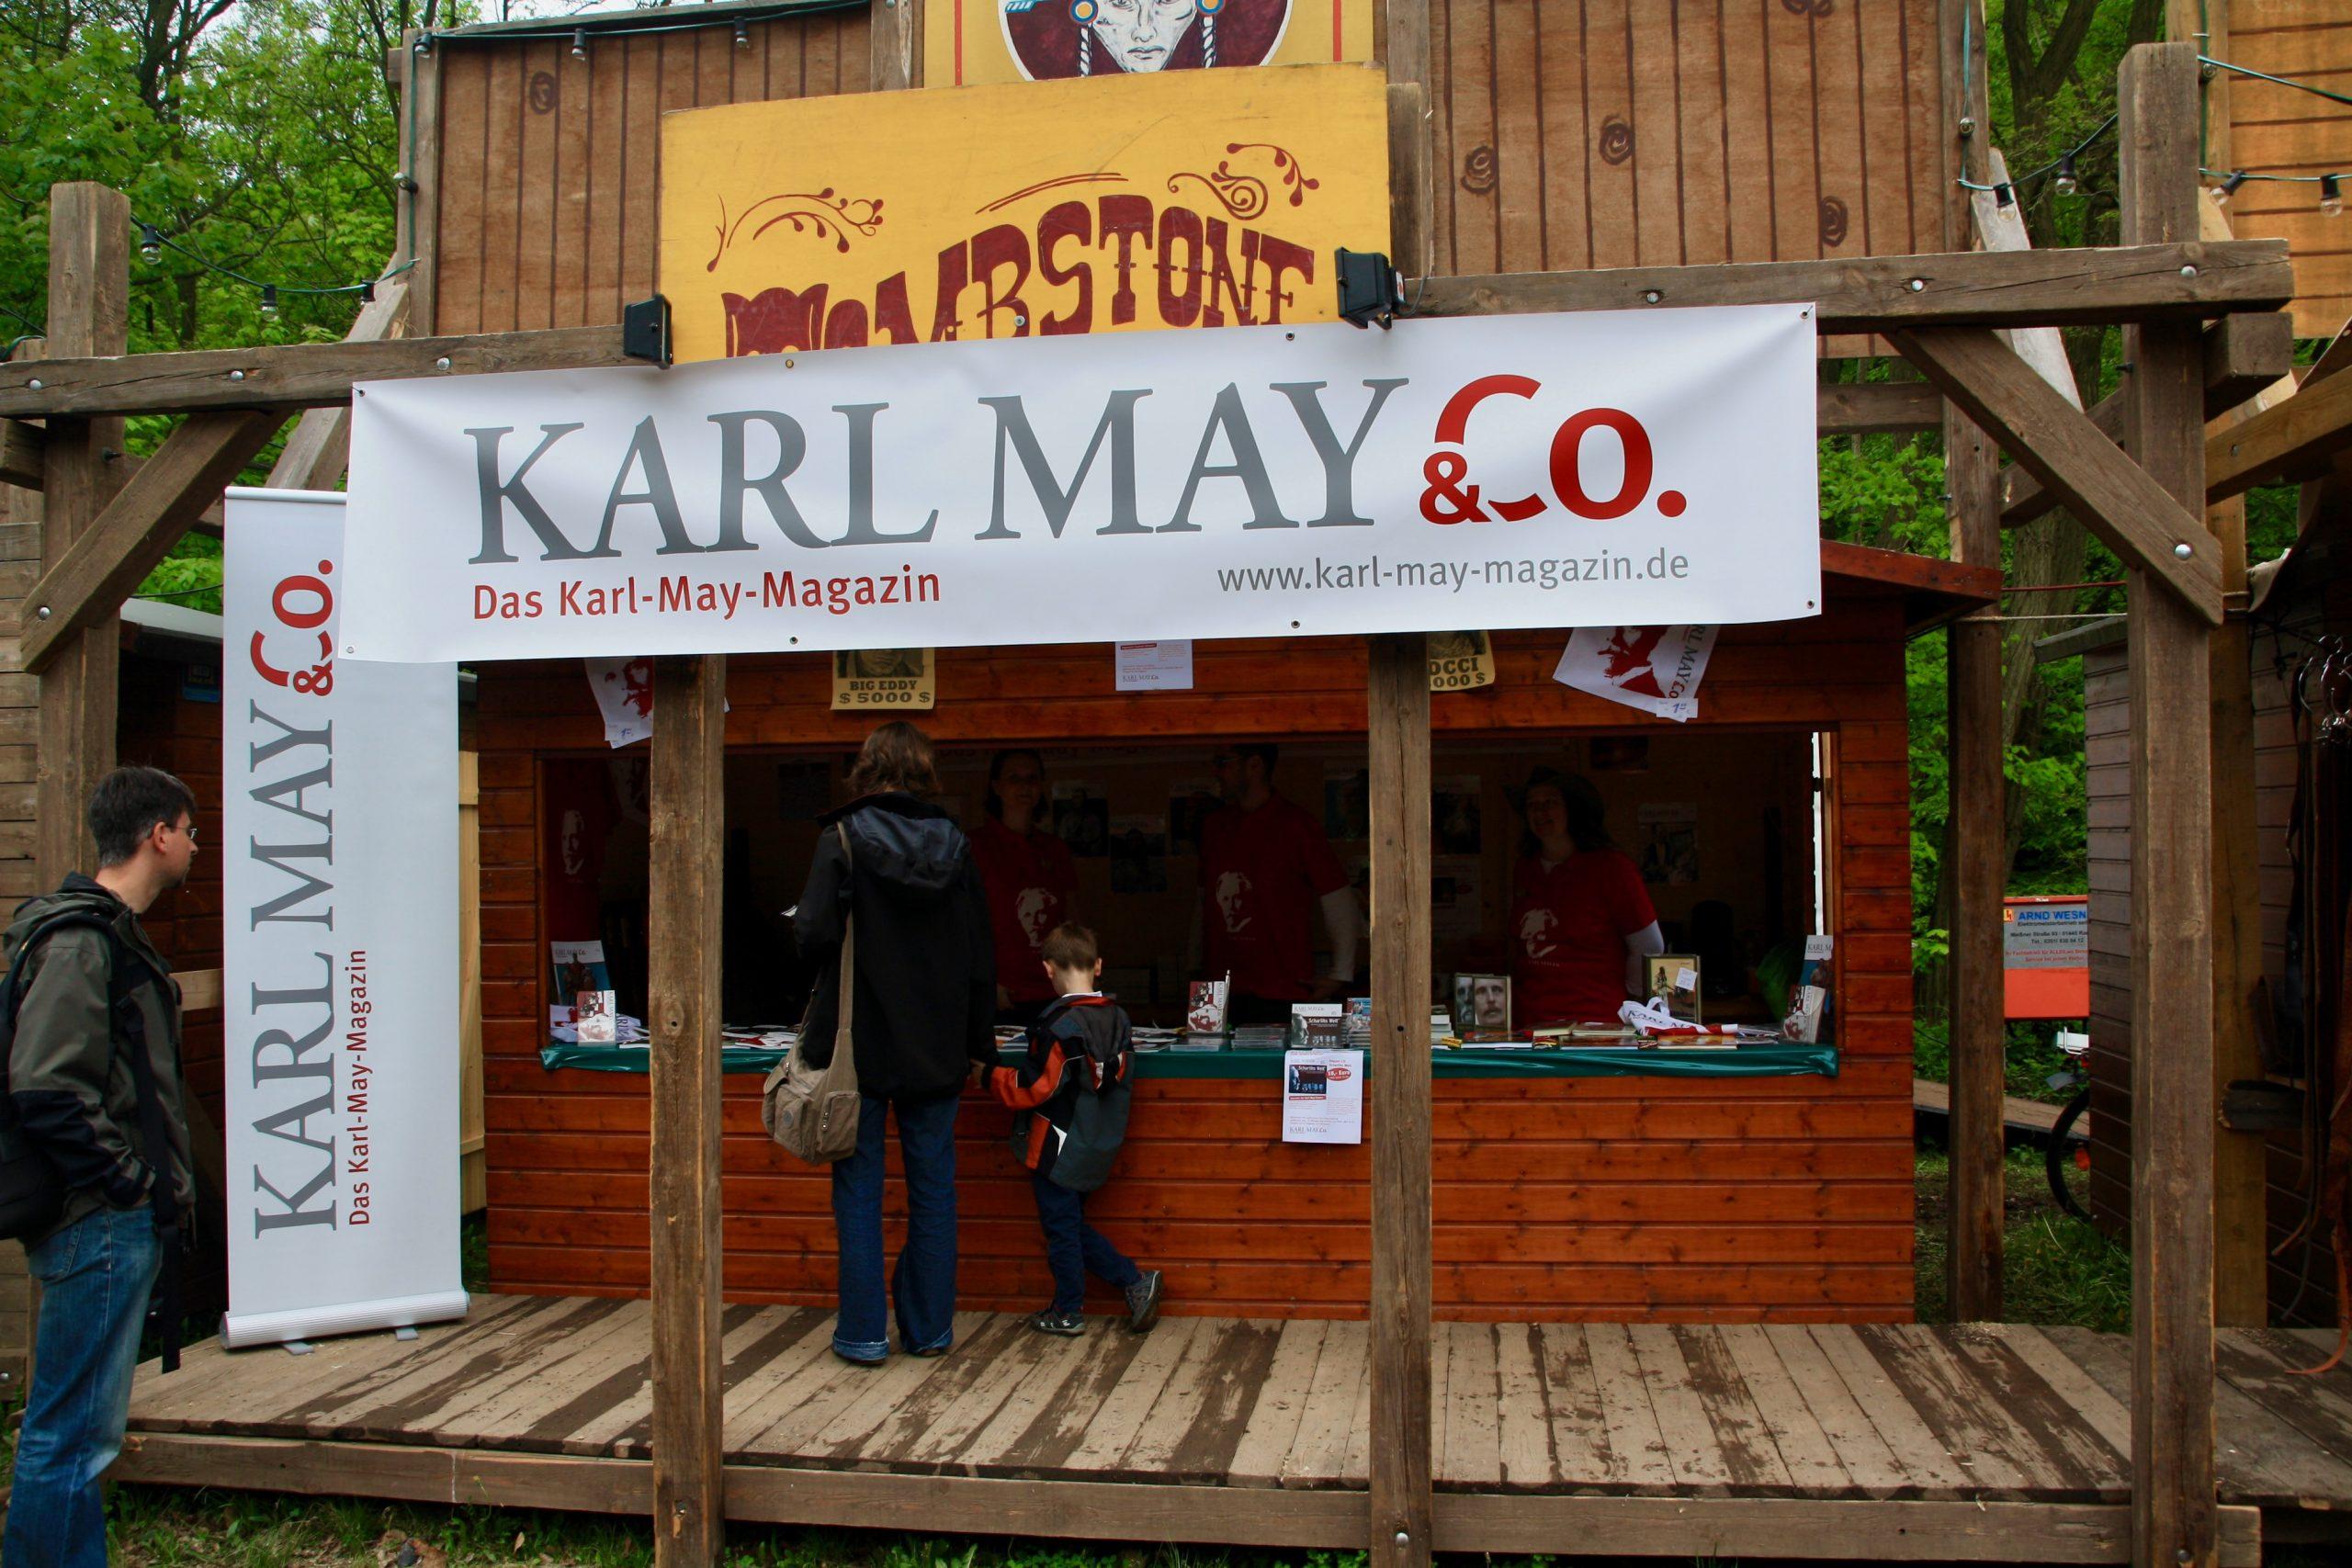 KARL MAY & Co. 2013 bei den Karl-May-Festtagen in Radebeul